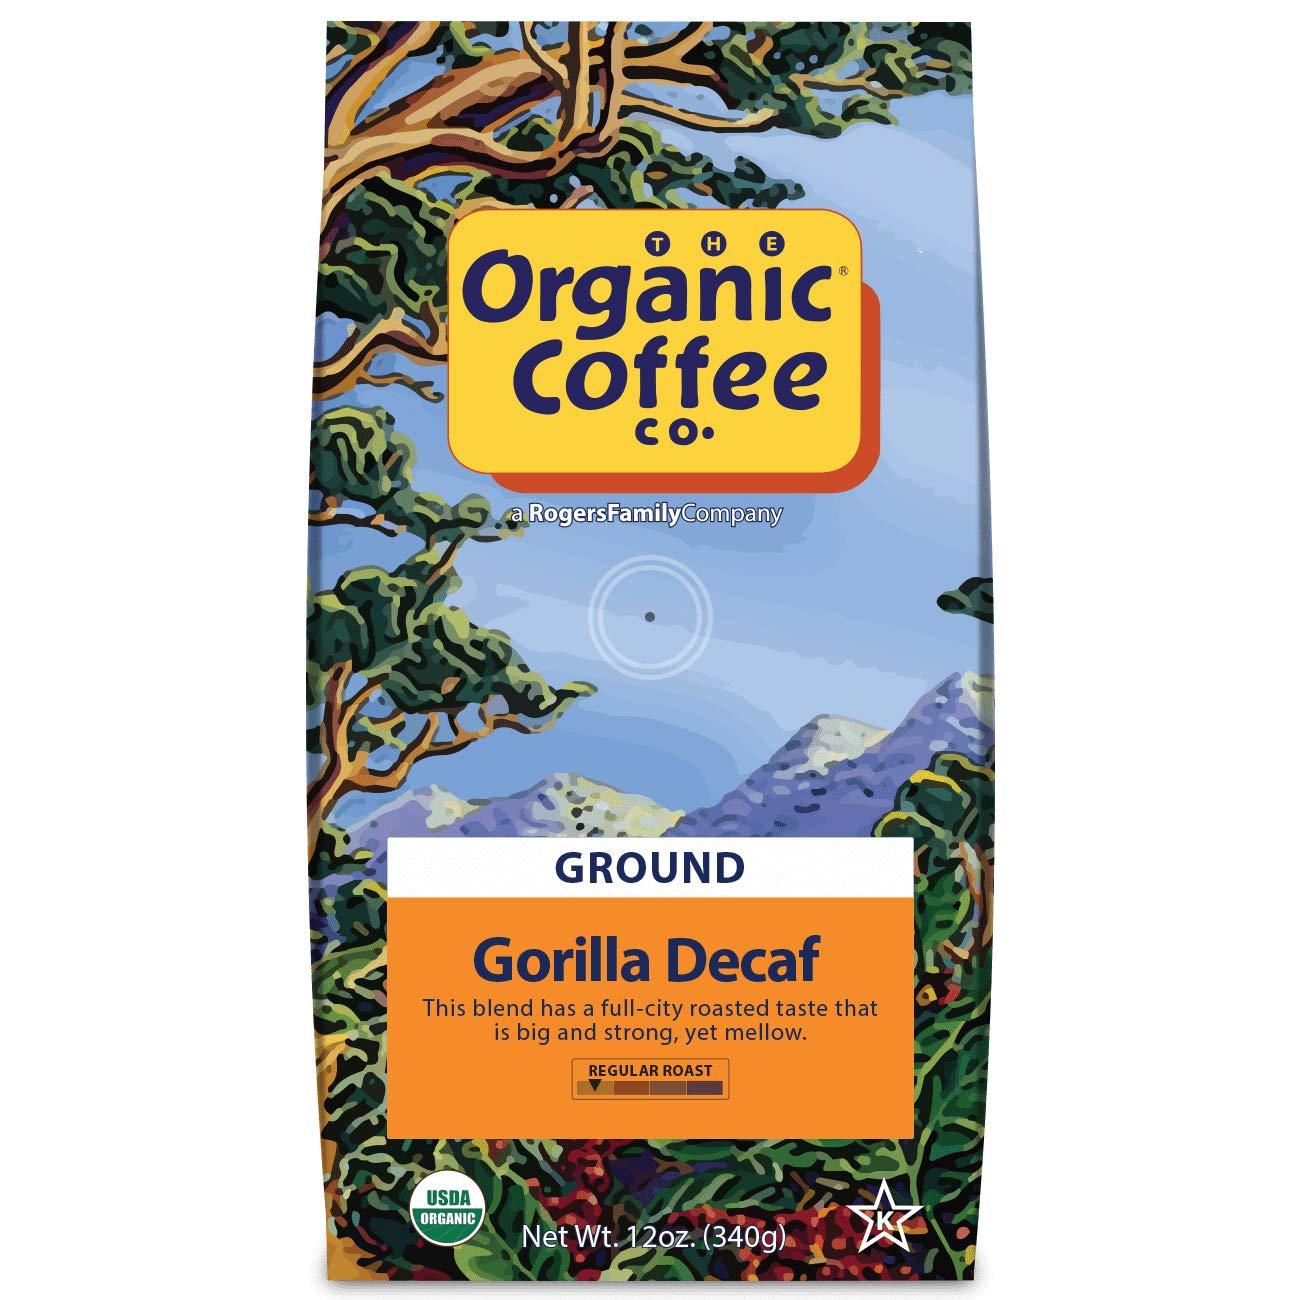 The Organic Coffee Co. Gorilla Decaf Ground Coffee 12 Ounce Medium Light Roast Natural Water Processed USDA Organic